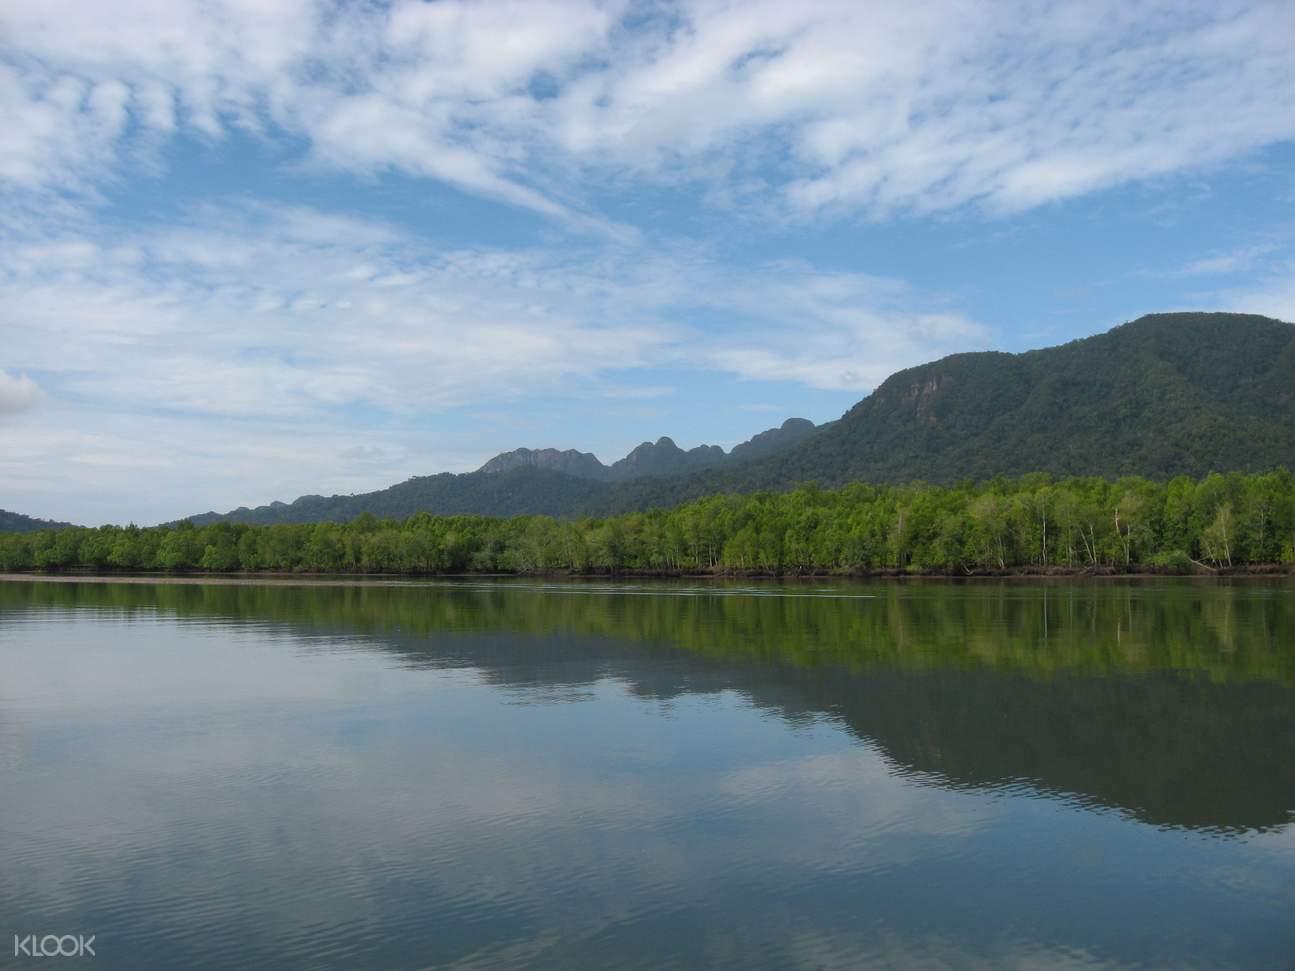 Kubang Badak River Mangrove Forest